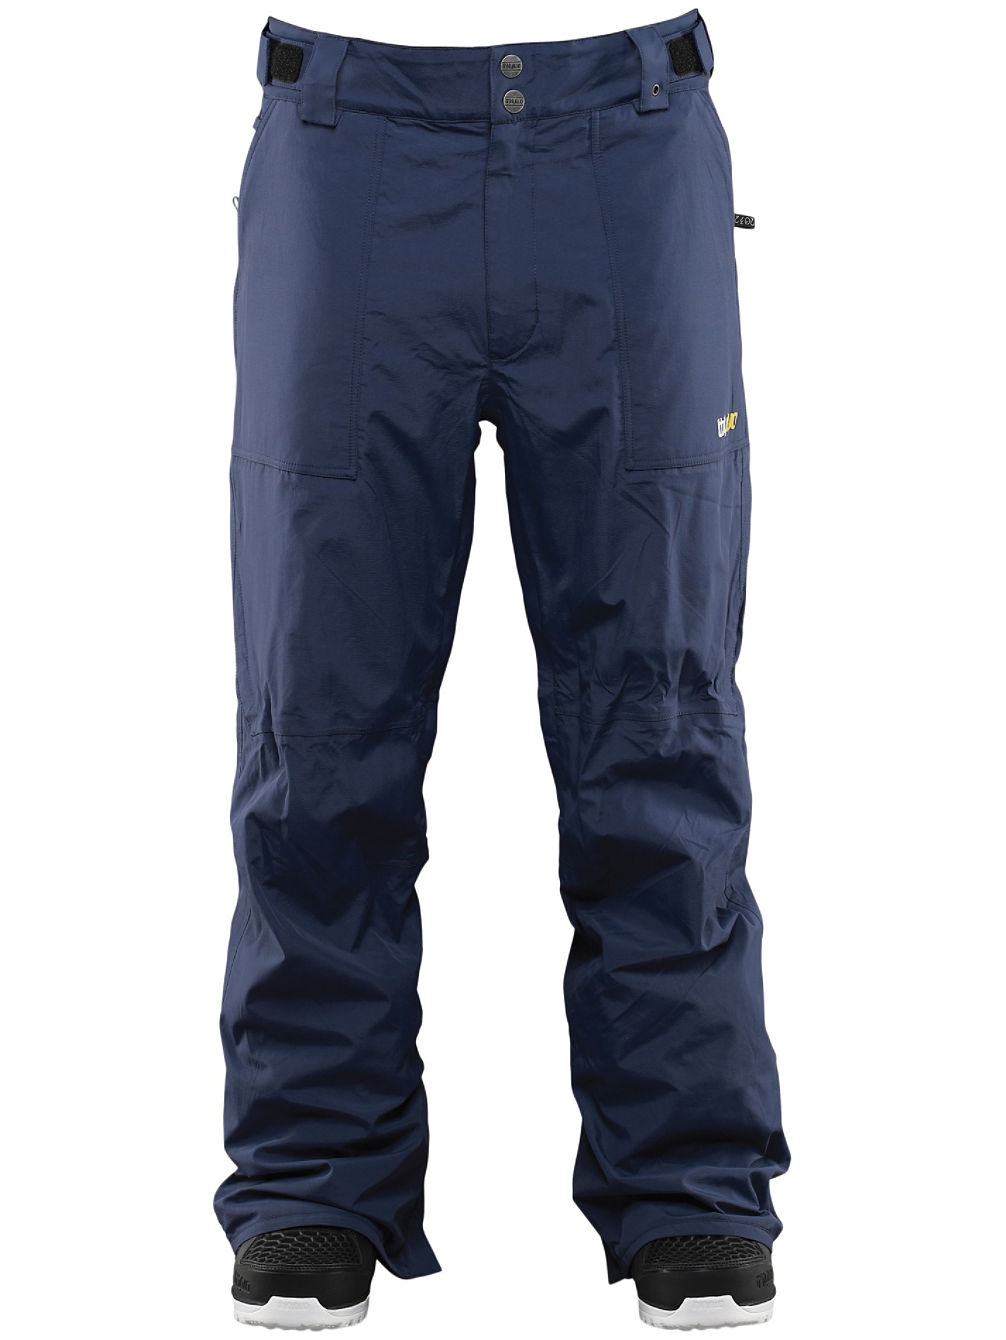 engler-pants